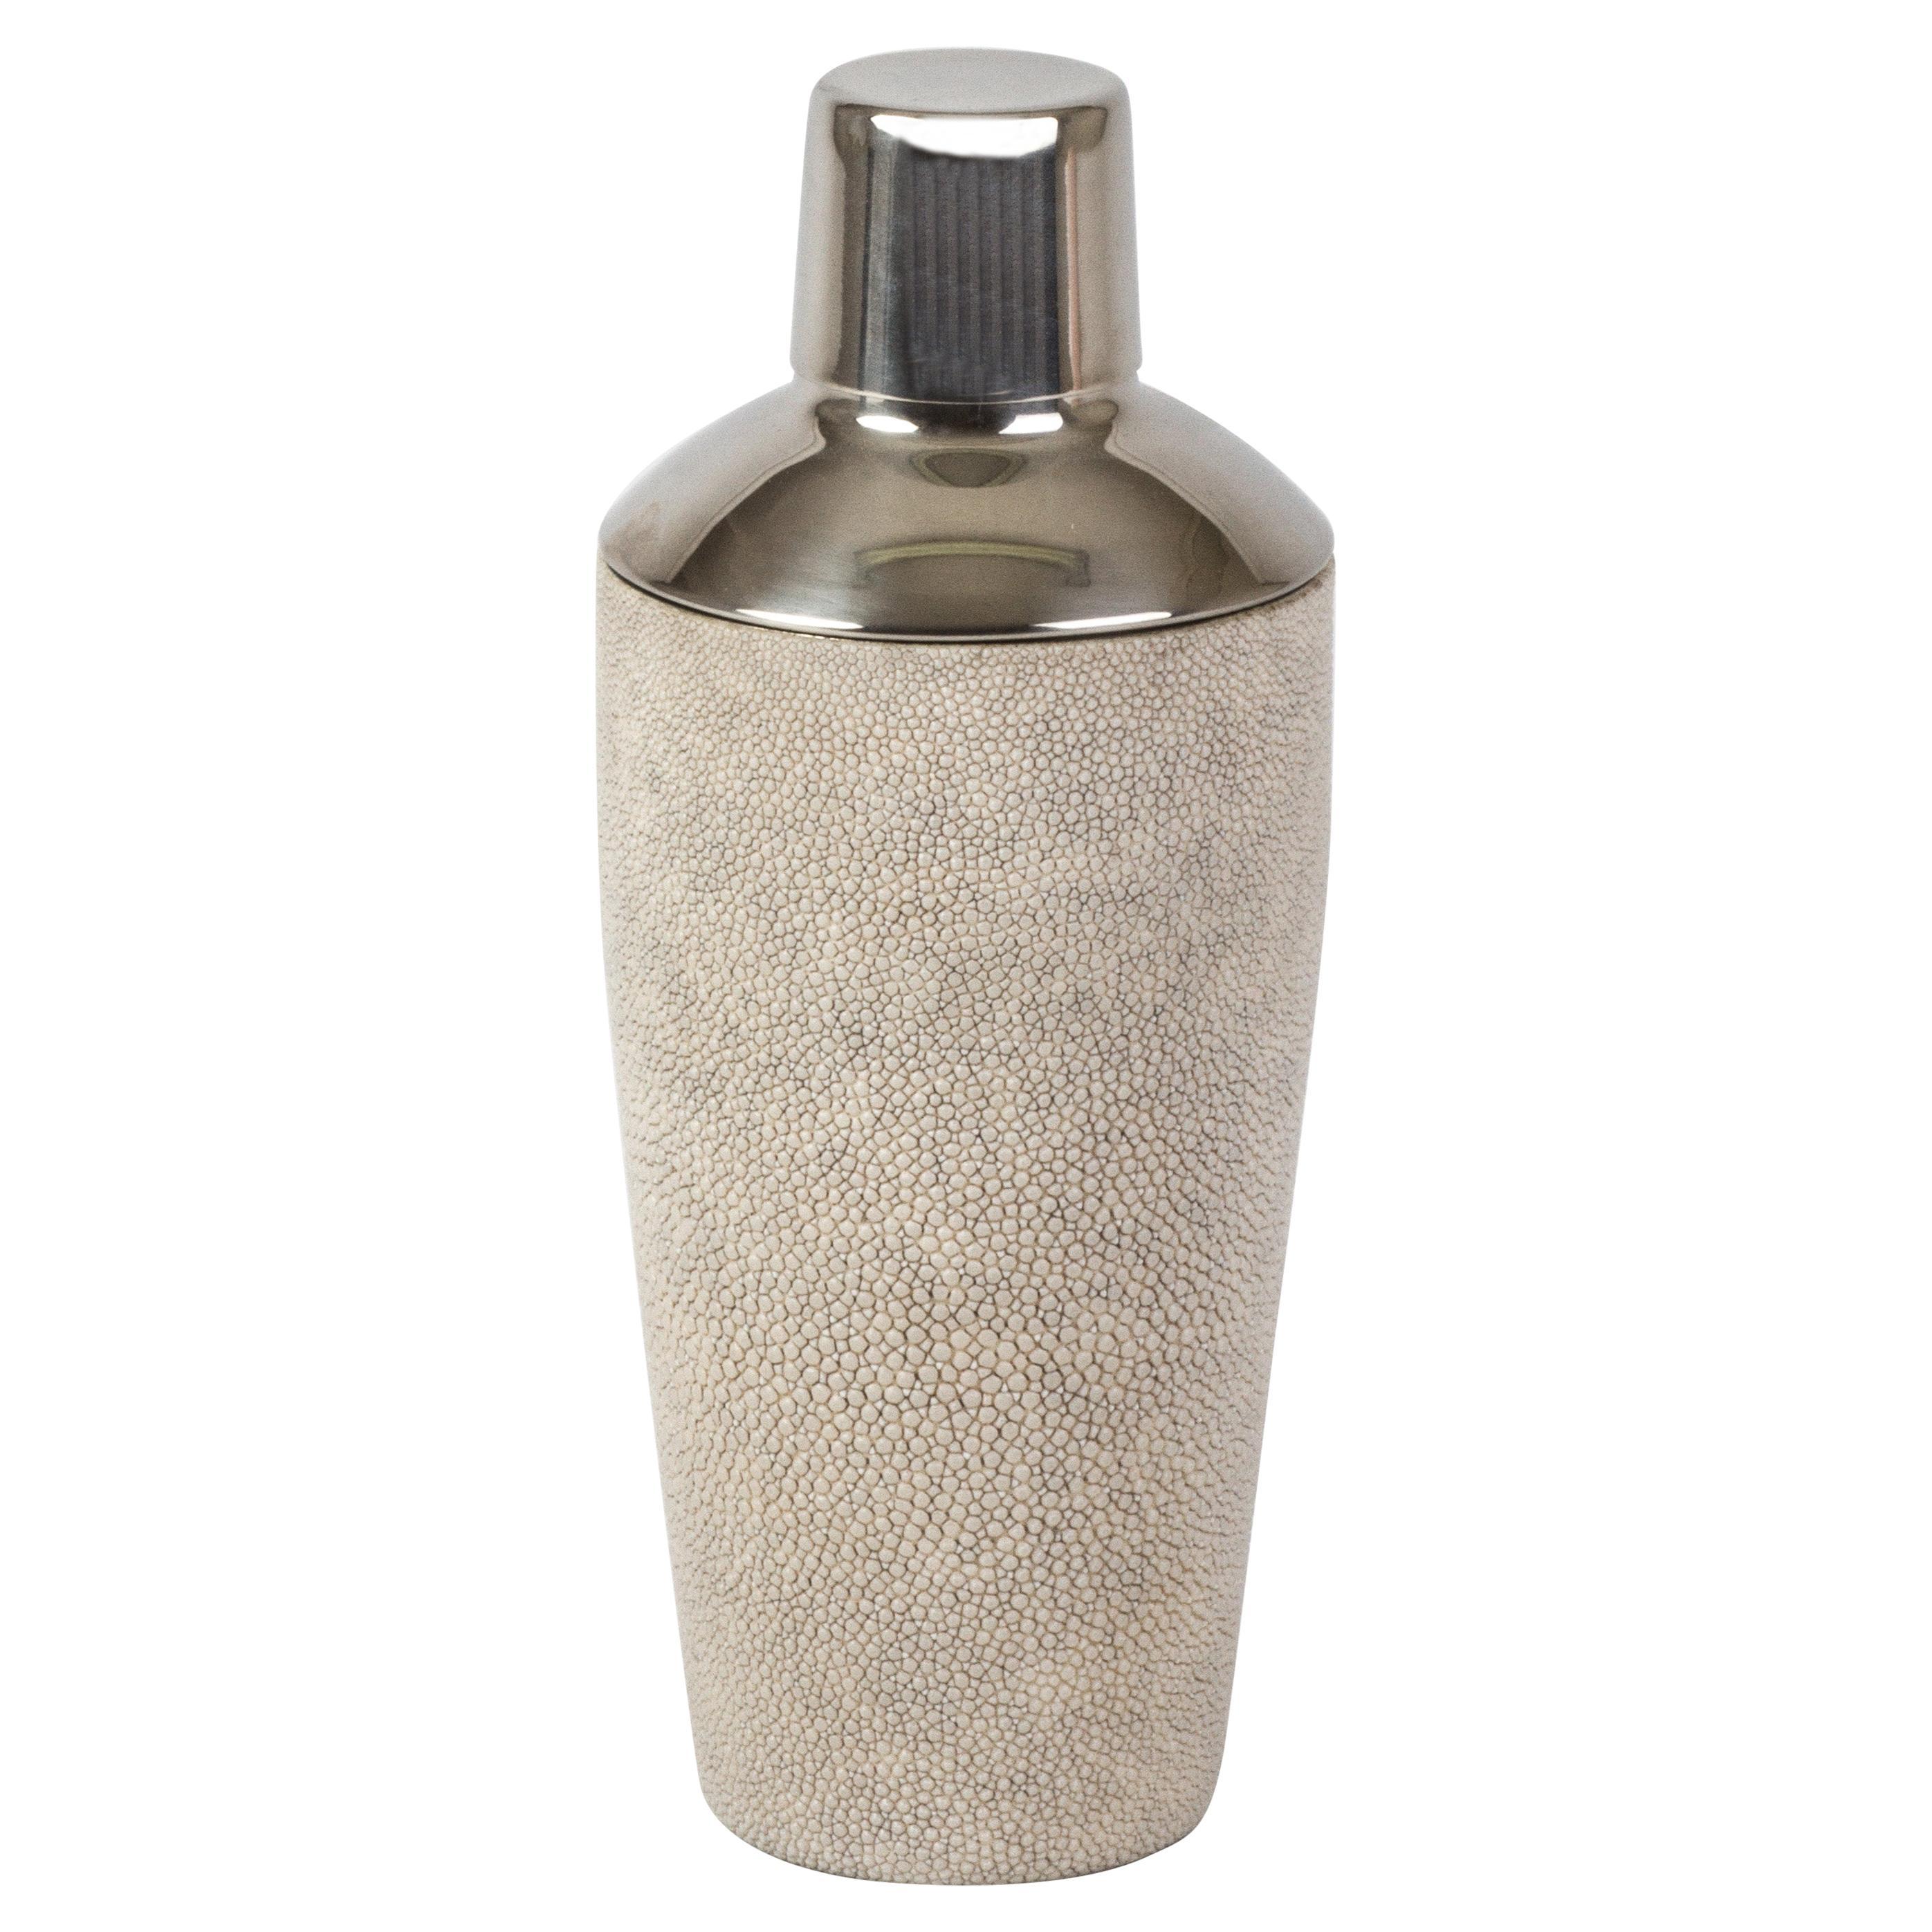 Shaker in Ivory Shagreen by Kifu Paris